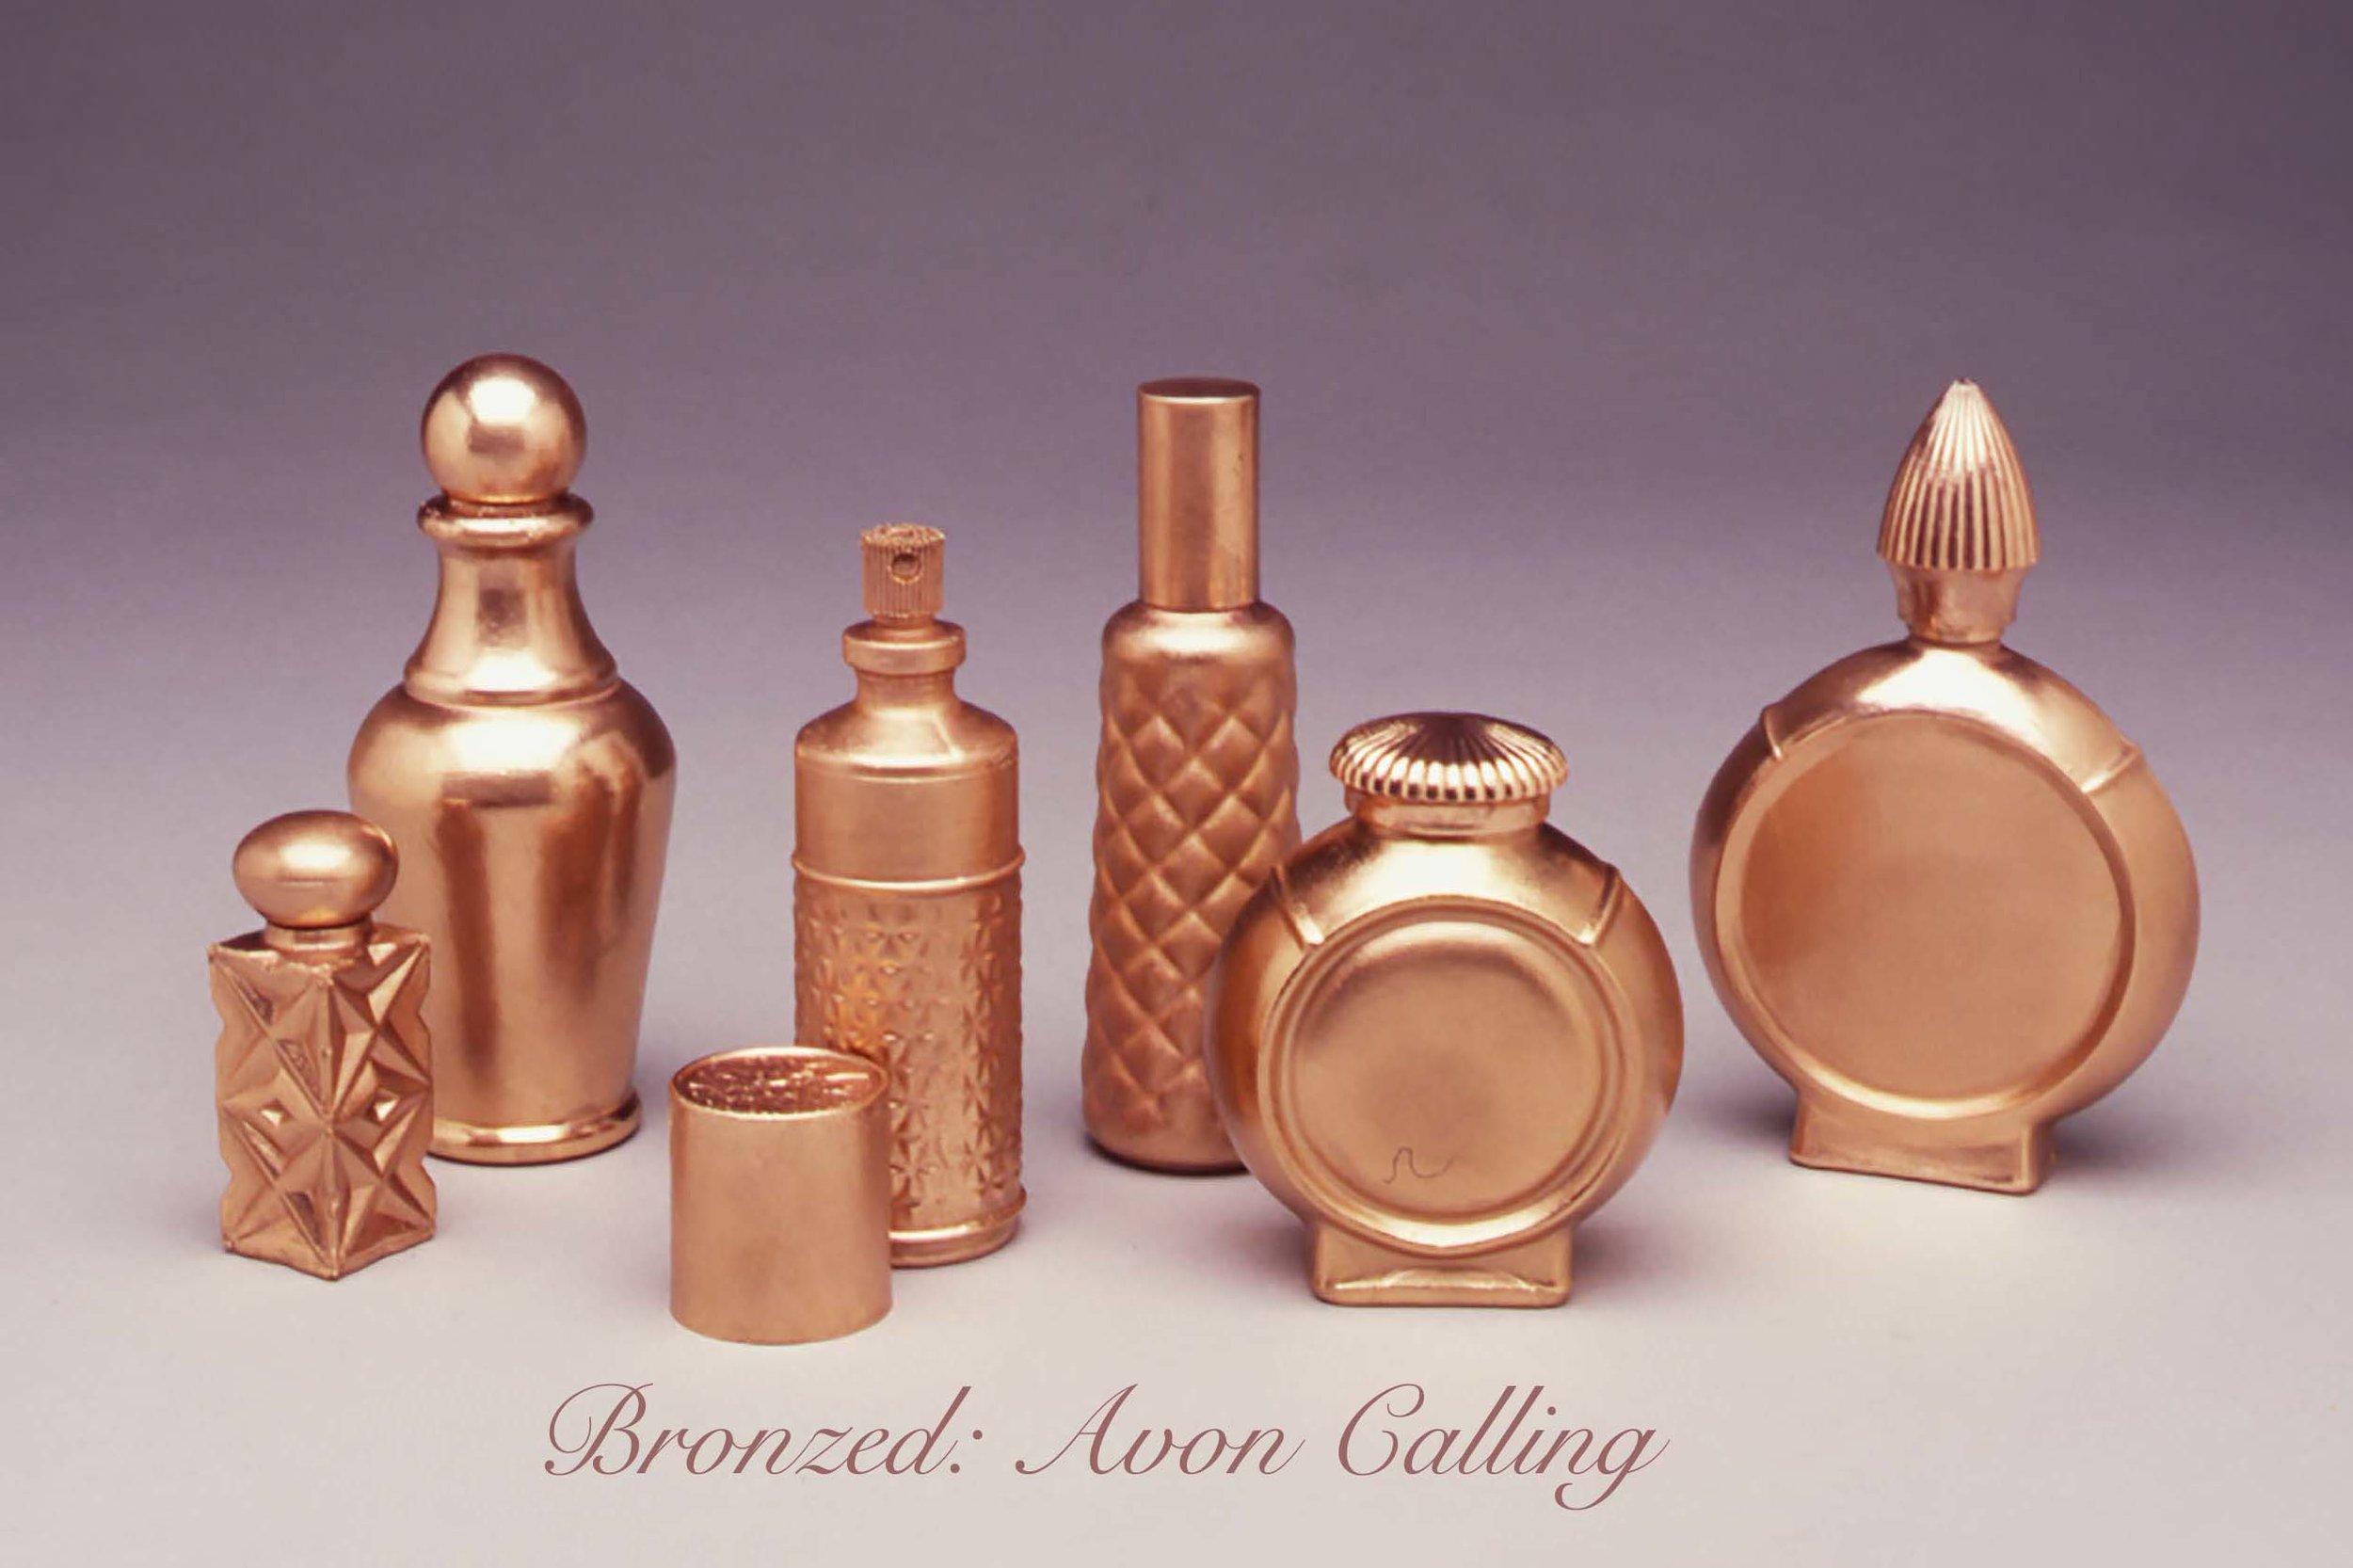 Bronzed-AvonCalling-ps-txt.jpg